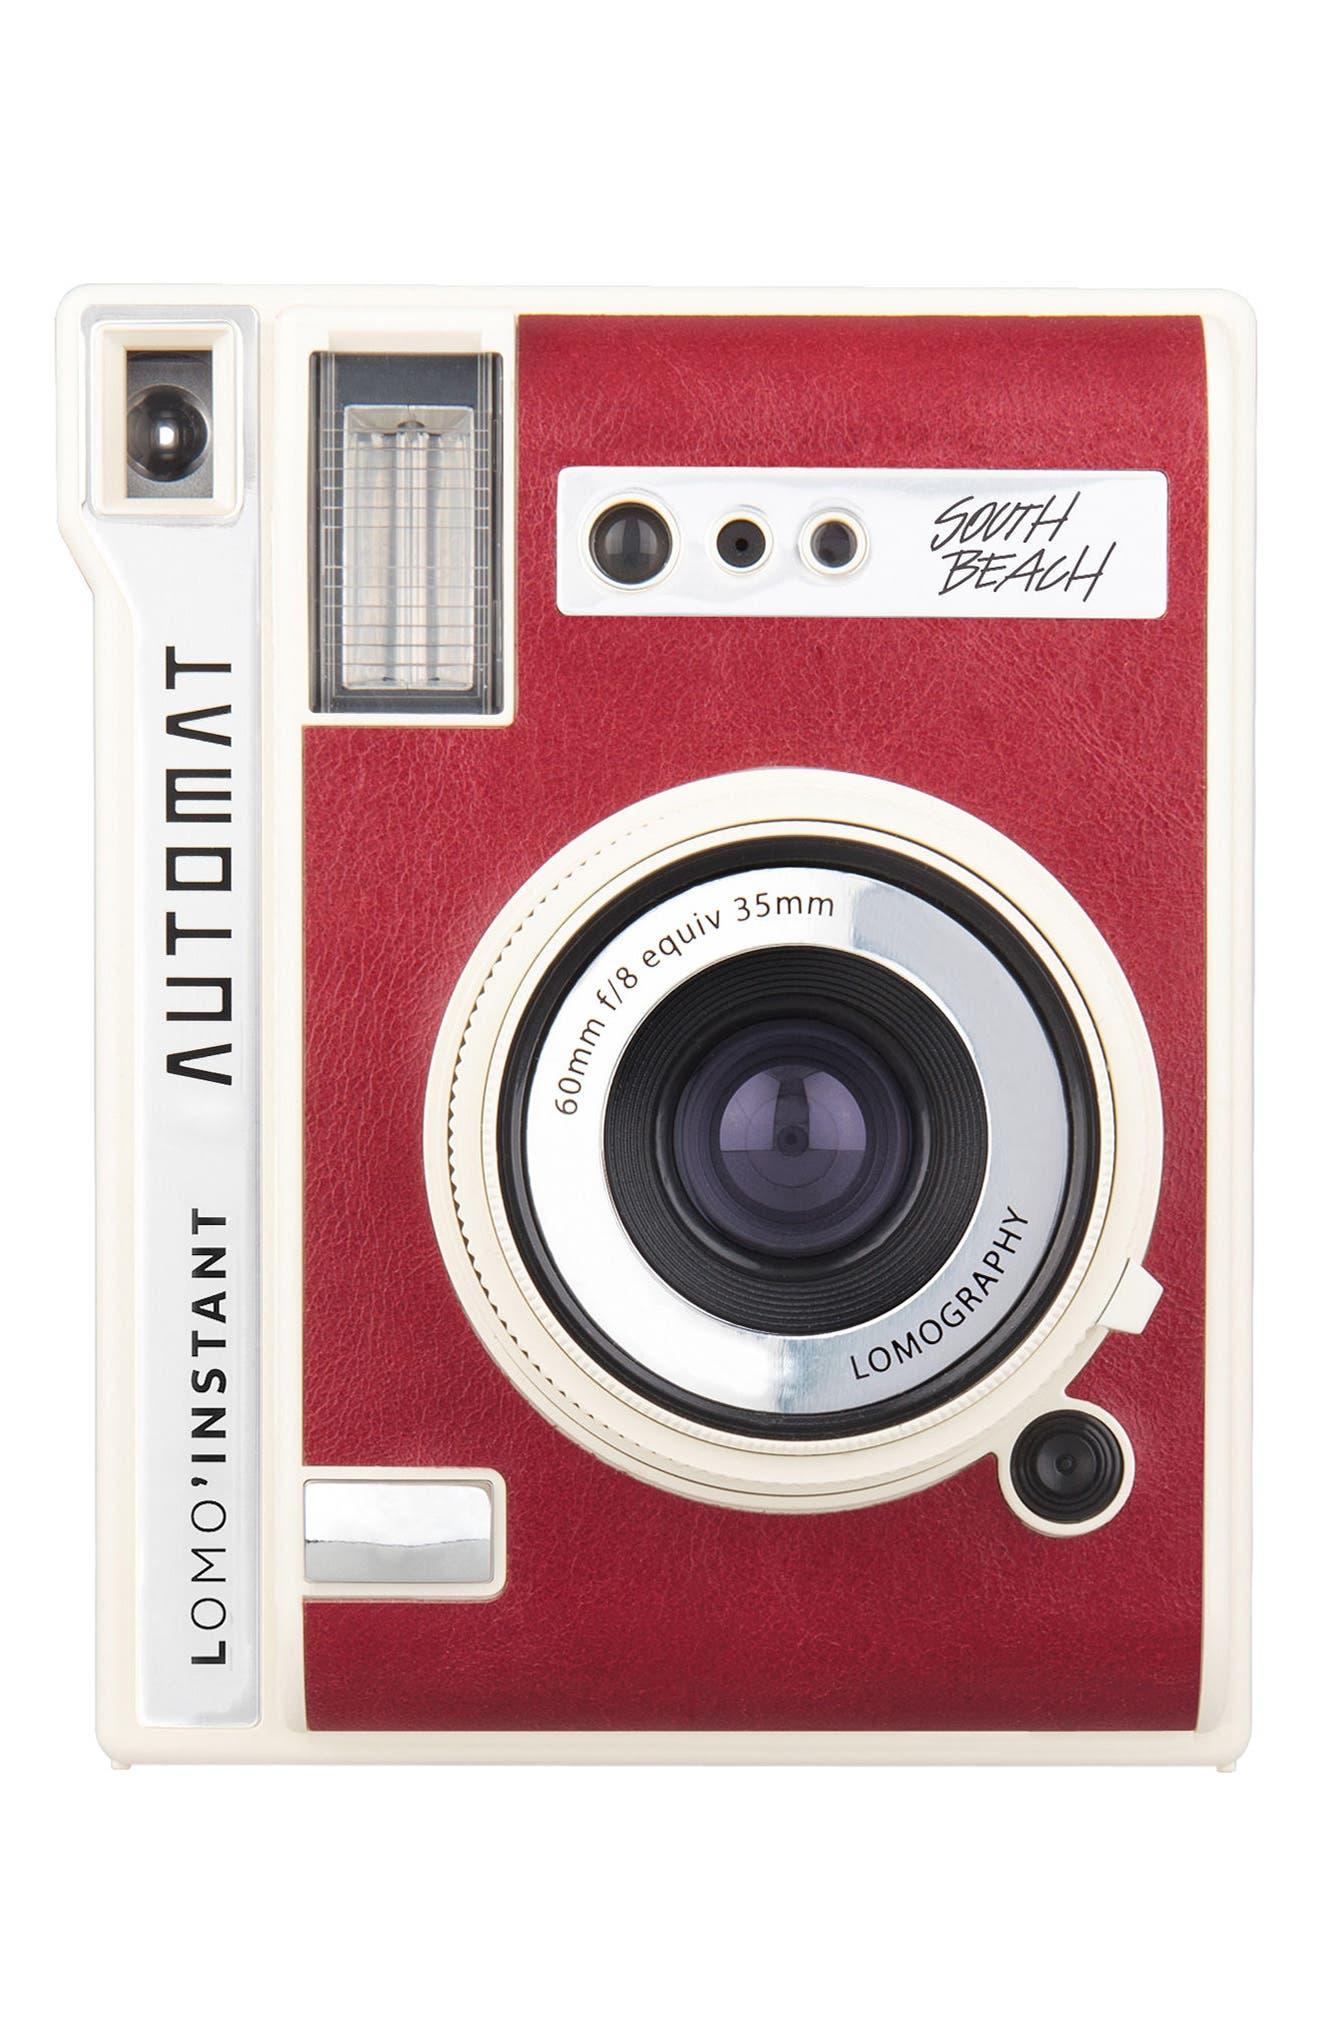 Lomo'Instant Automat South Beach Instant Camera, Main, color, 600